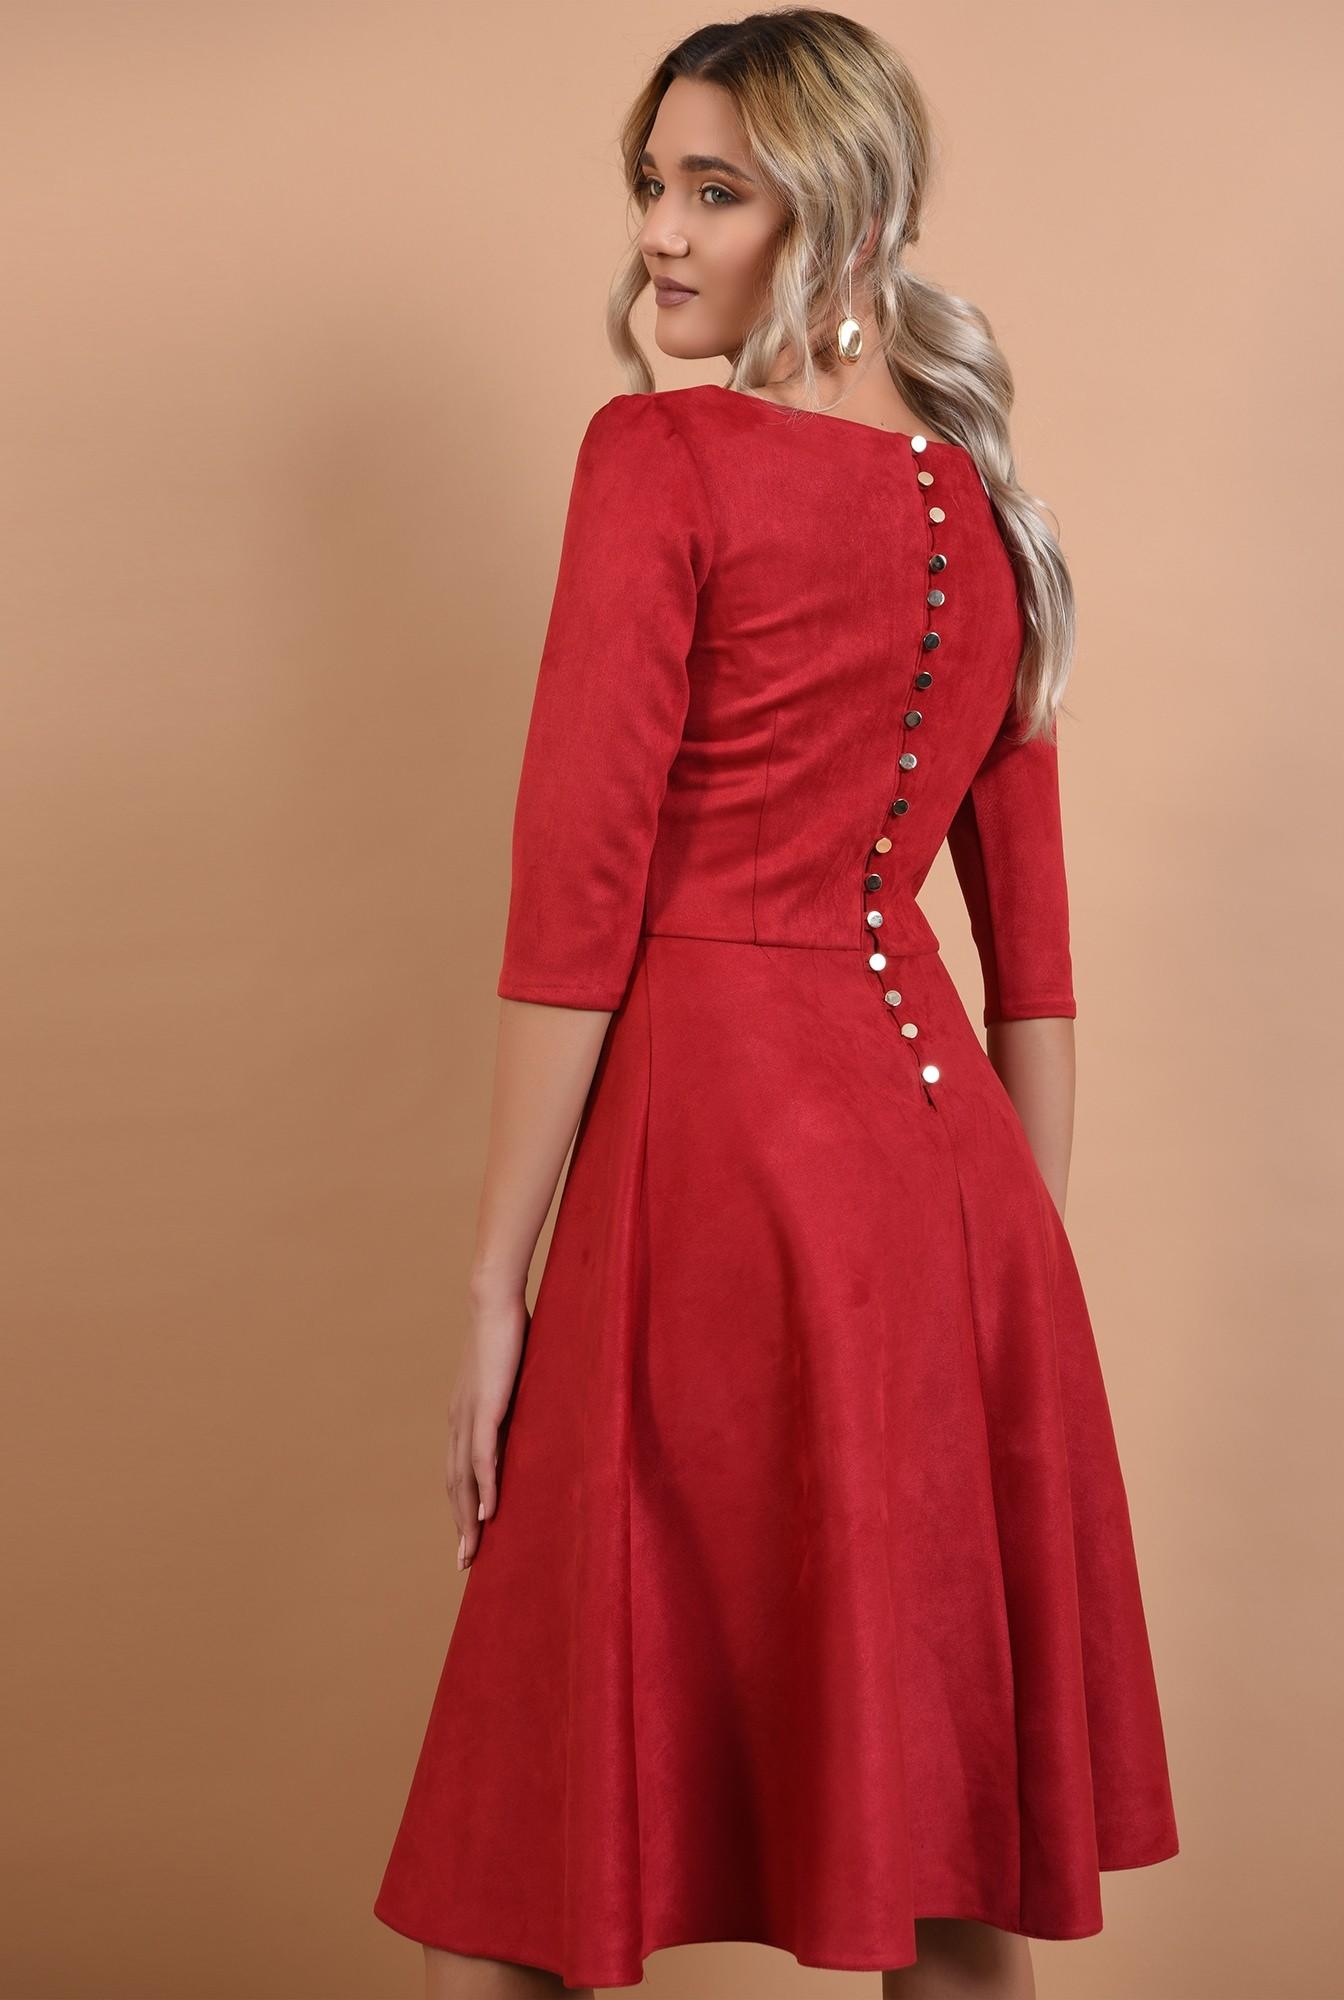 1 - rochie rosie, din piele intoarsa, maneci midi, nasturi aurii la spate, Poema